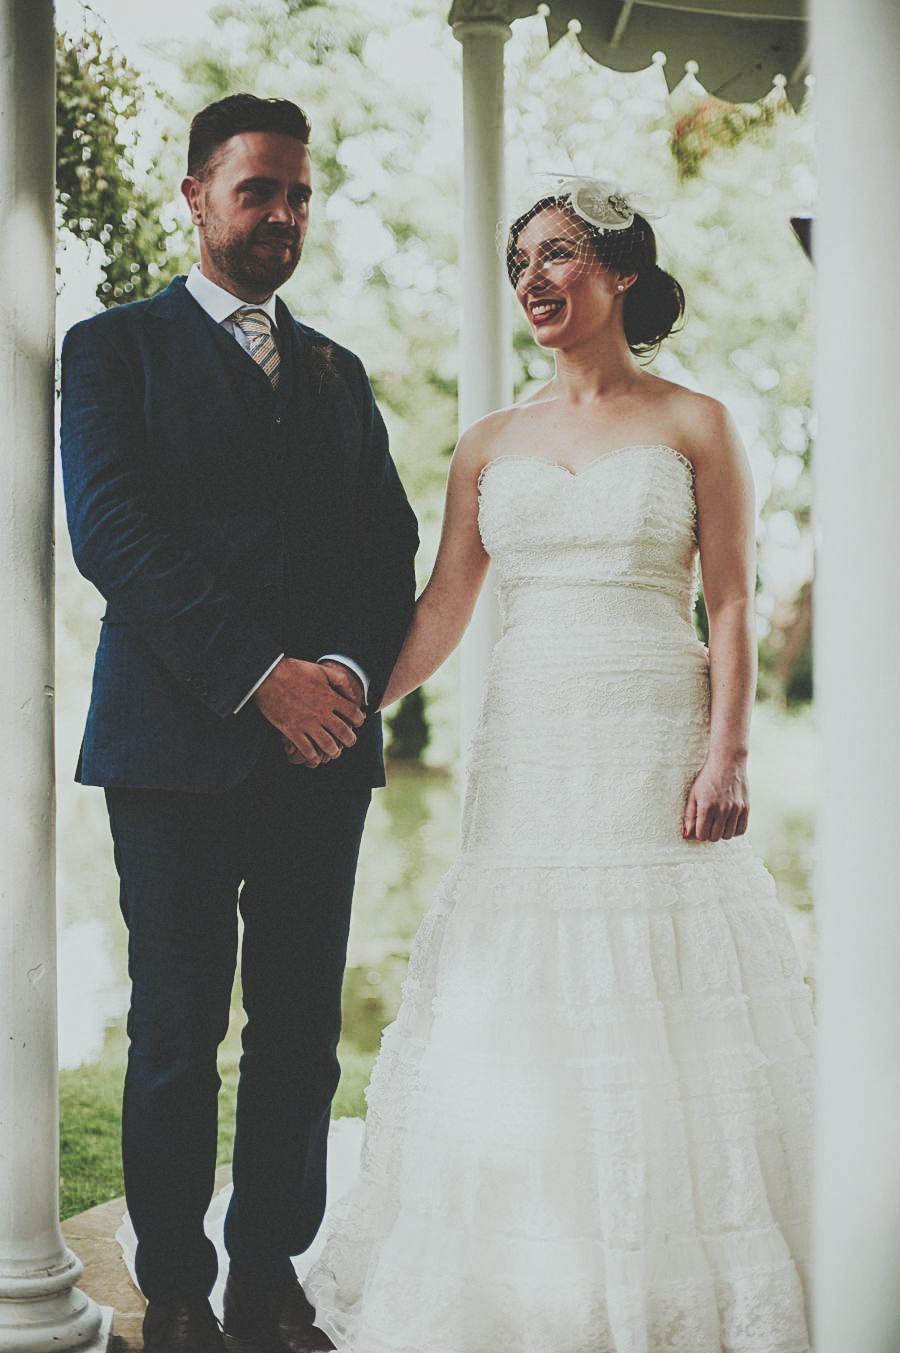 preston-court-wedding-photograph-kent--20.jpg